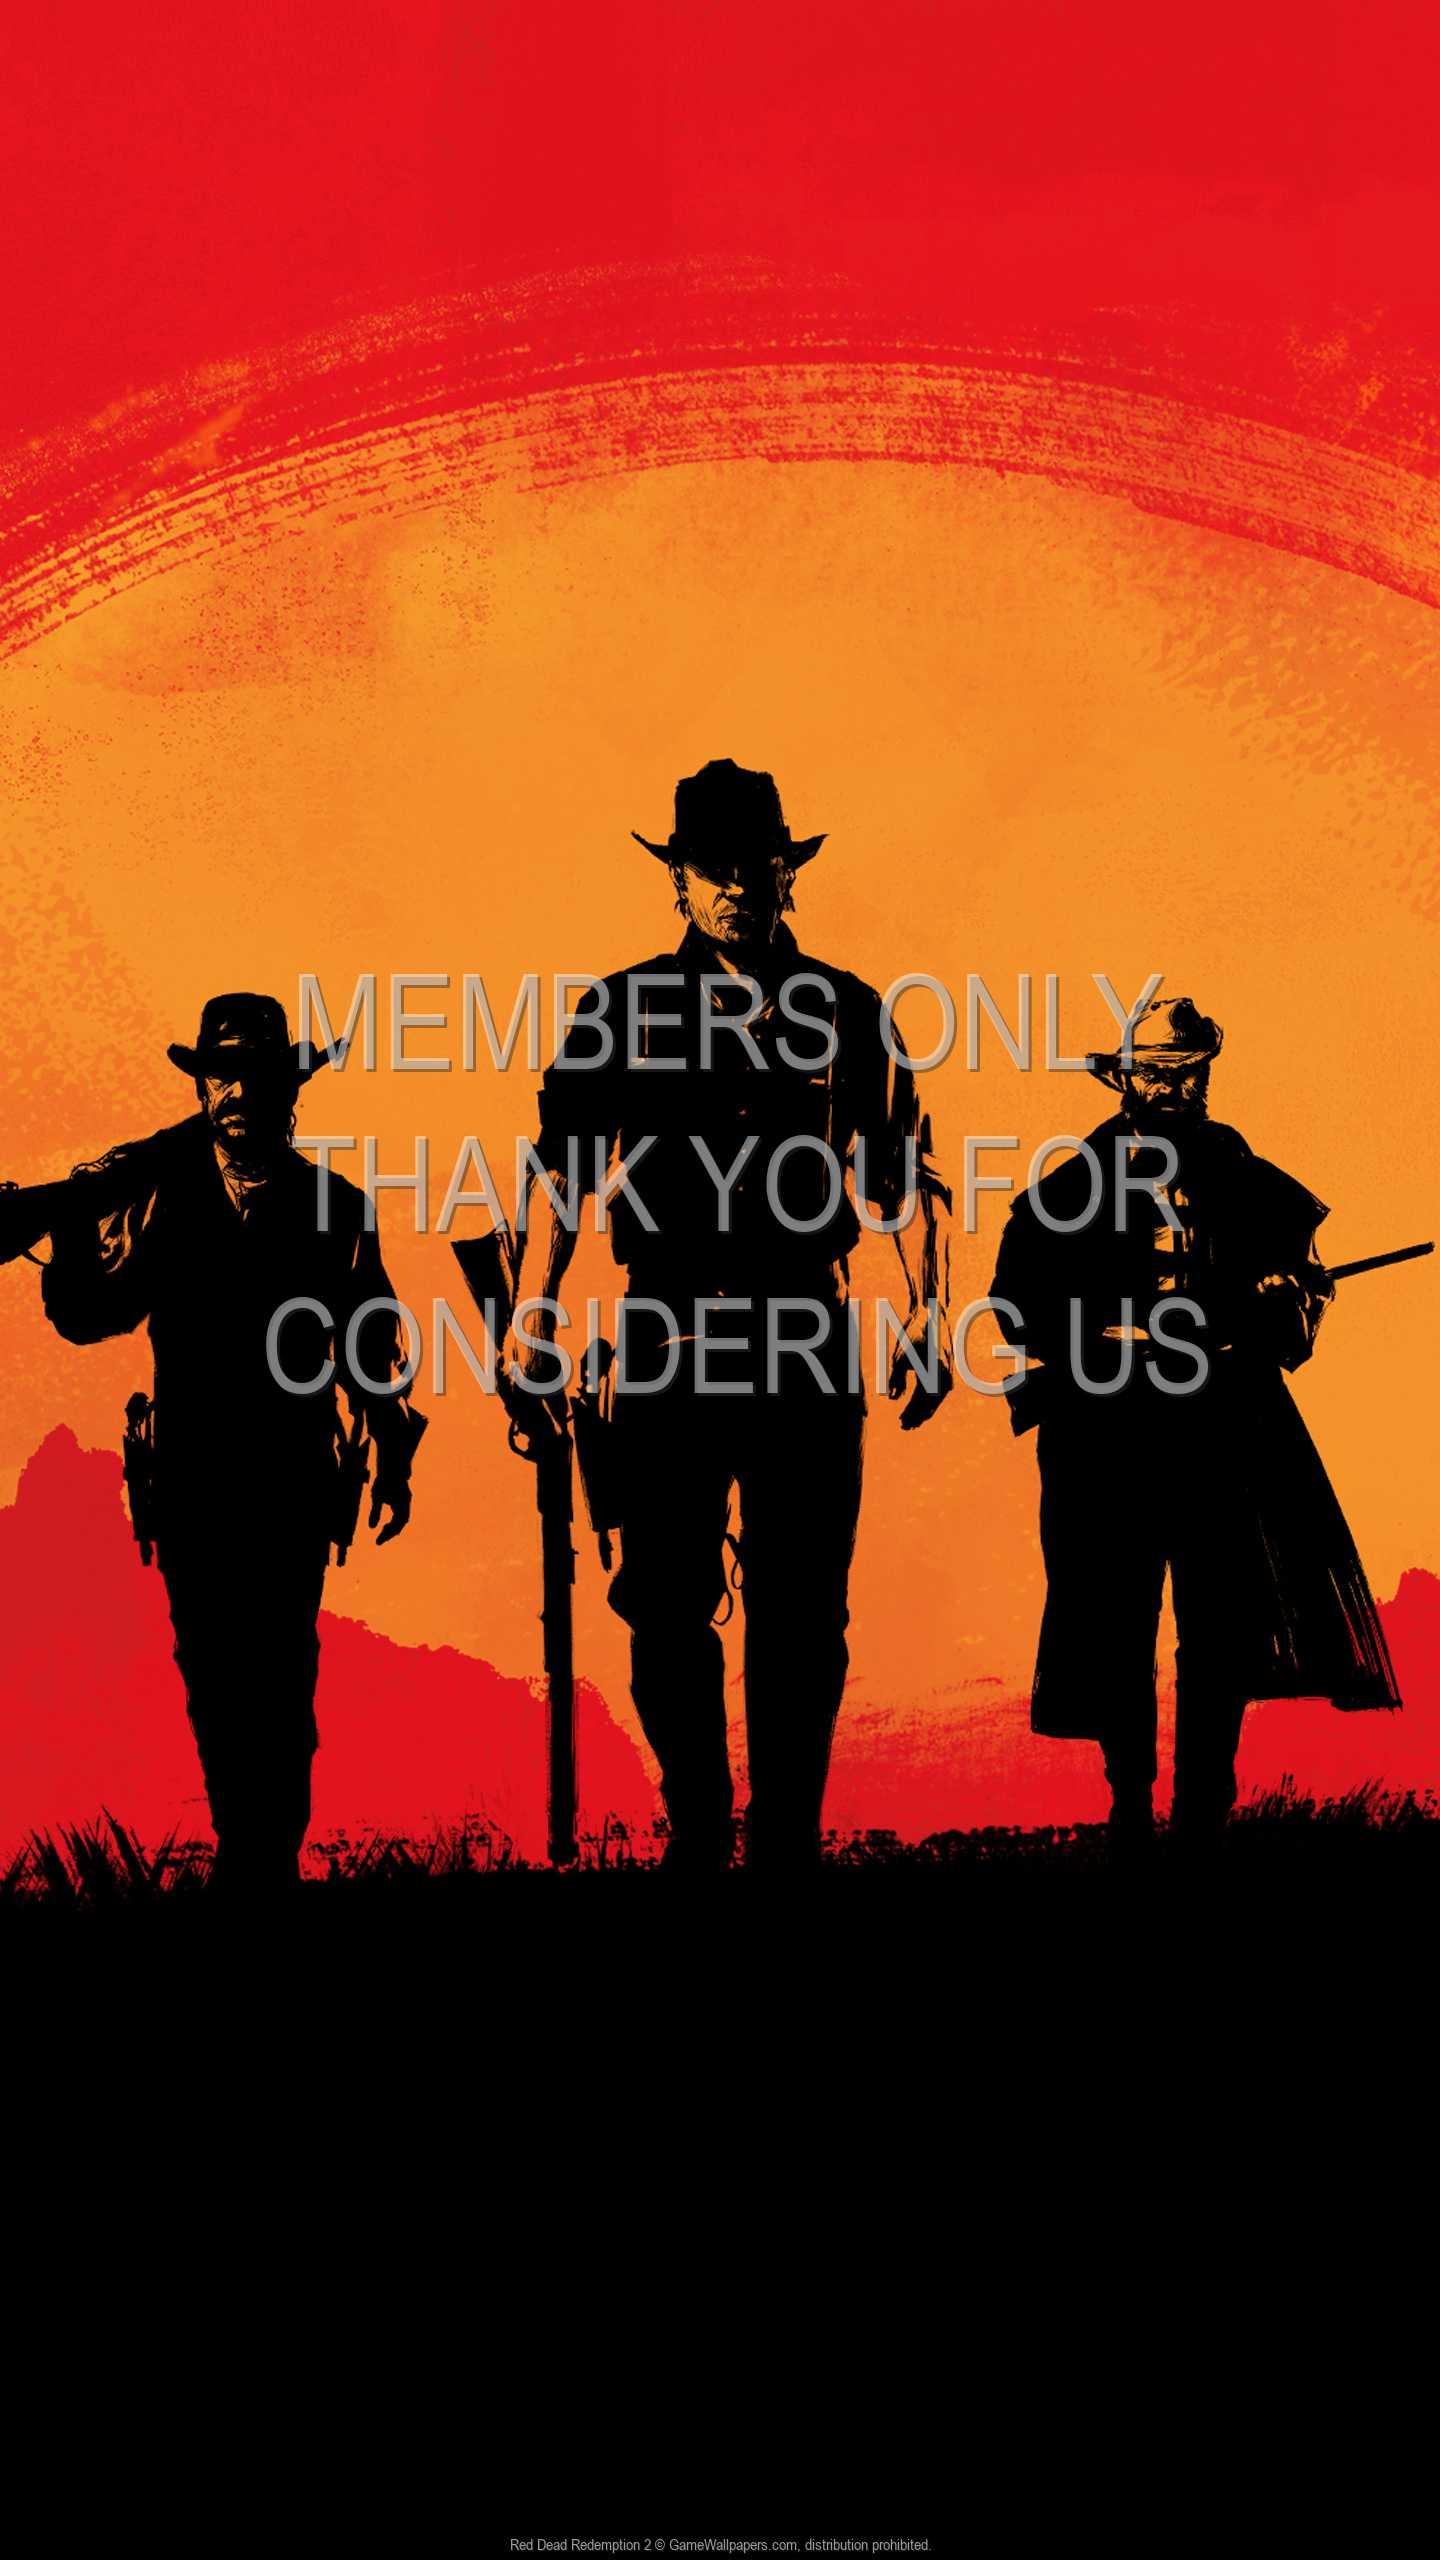 Red Dead Redemption 2 1440p Vertical Mobile wallpaper or background 01